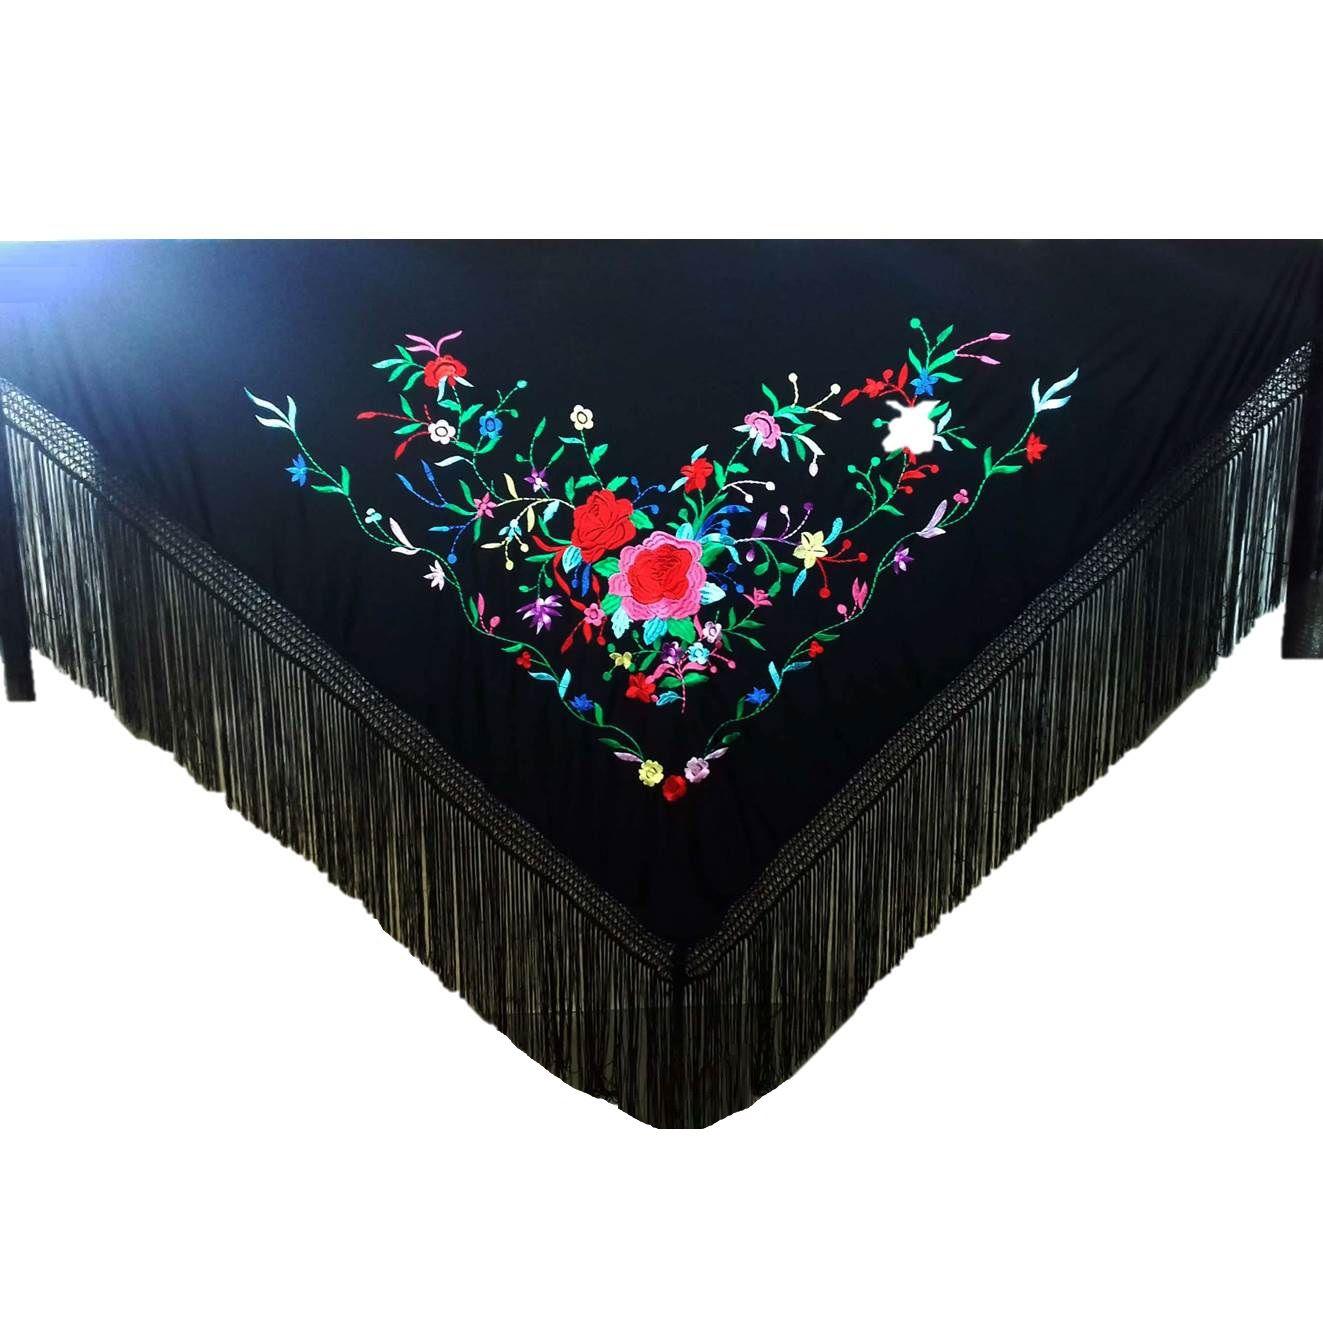 XALE ESPANHOL grande bordado 190x90cm flamenco preto colorido